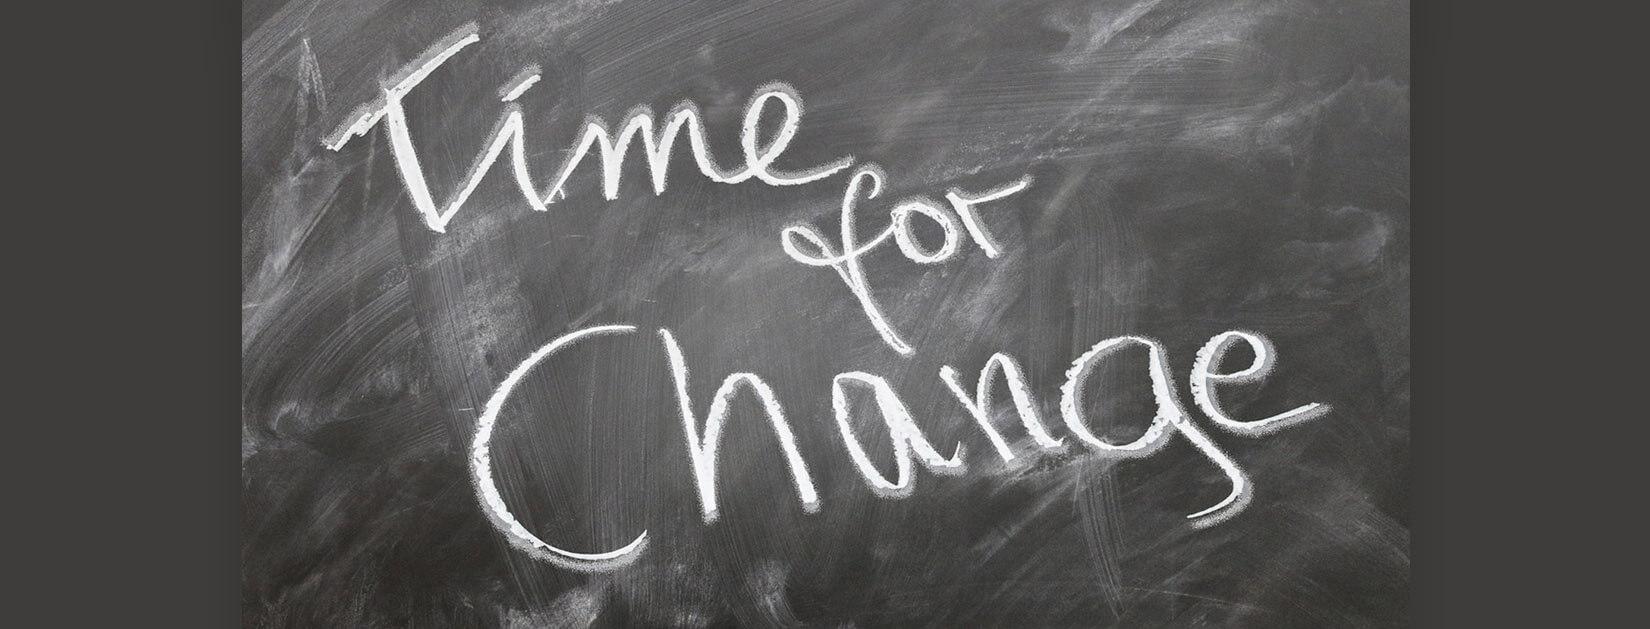 time for change written on a chalkboard